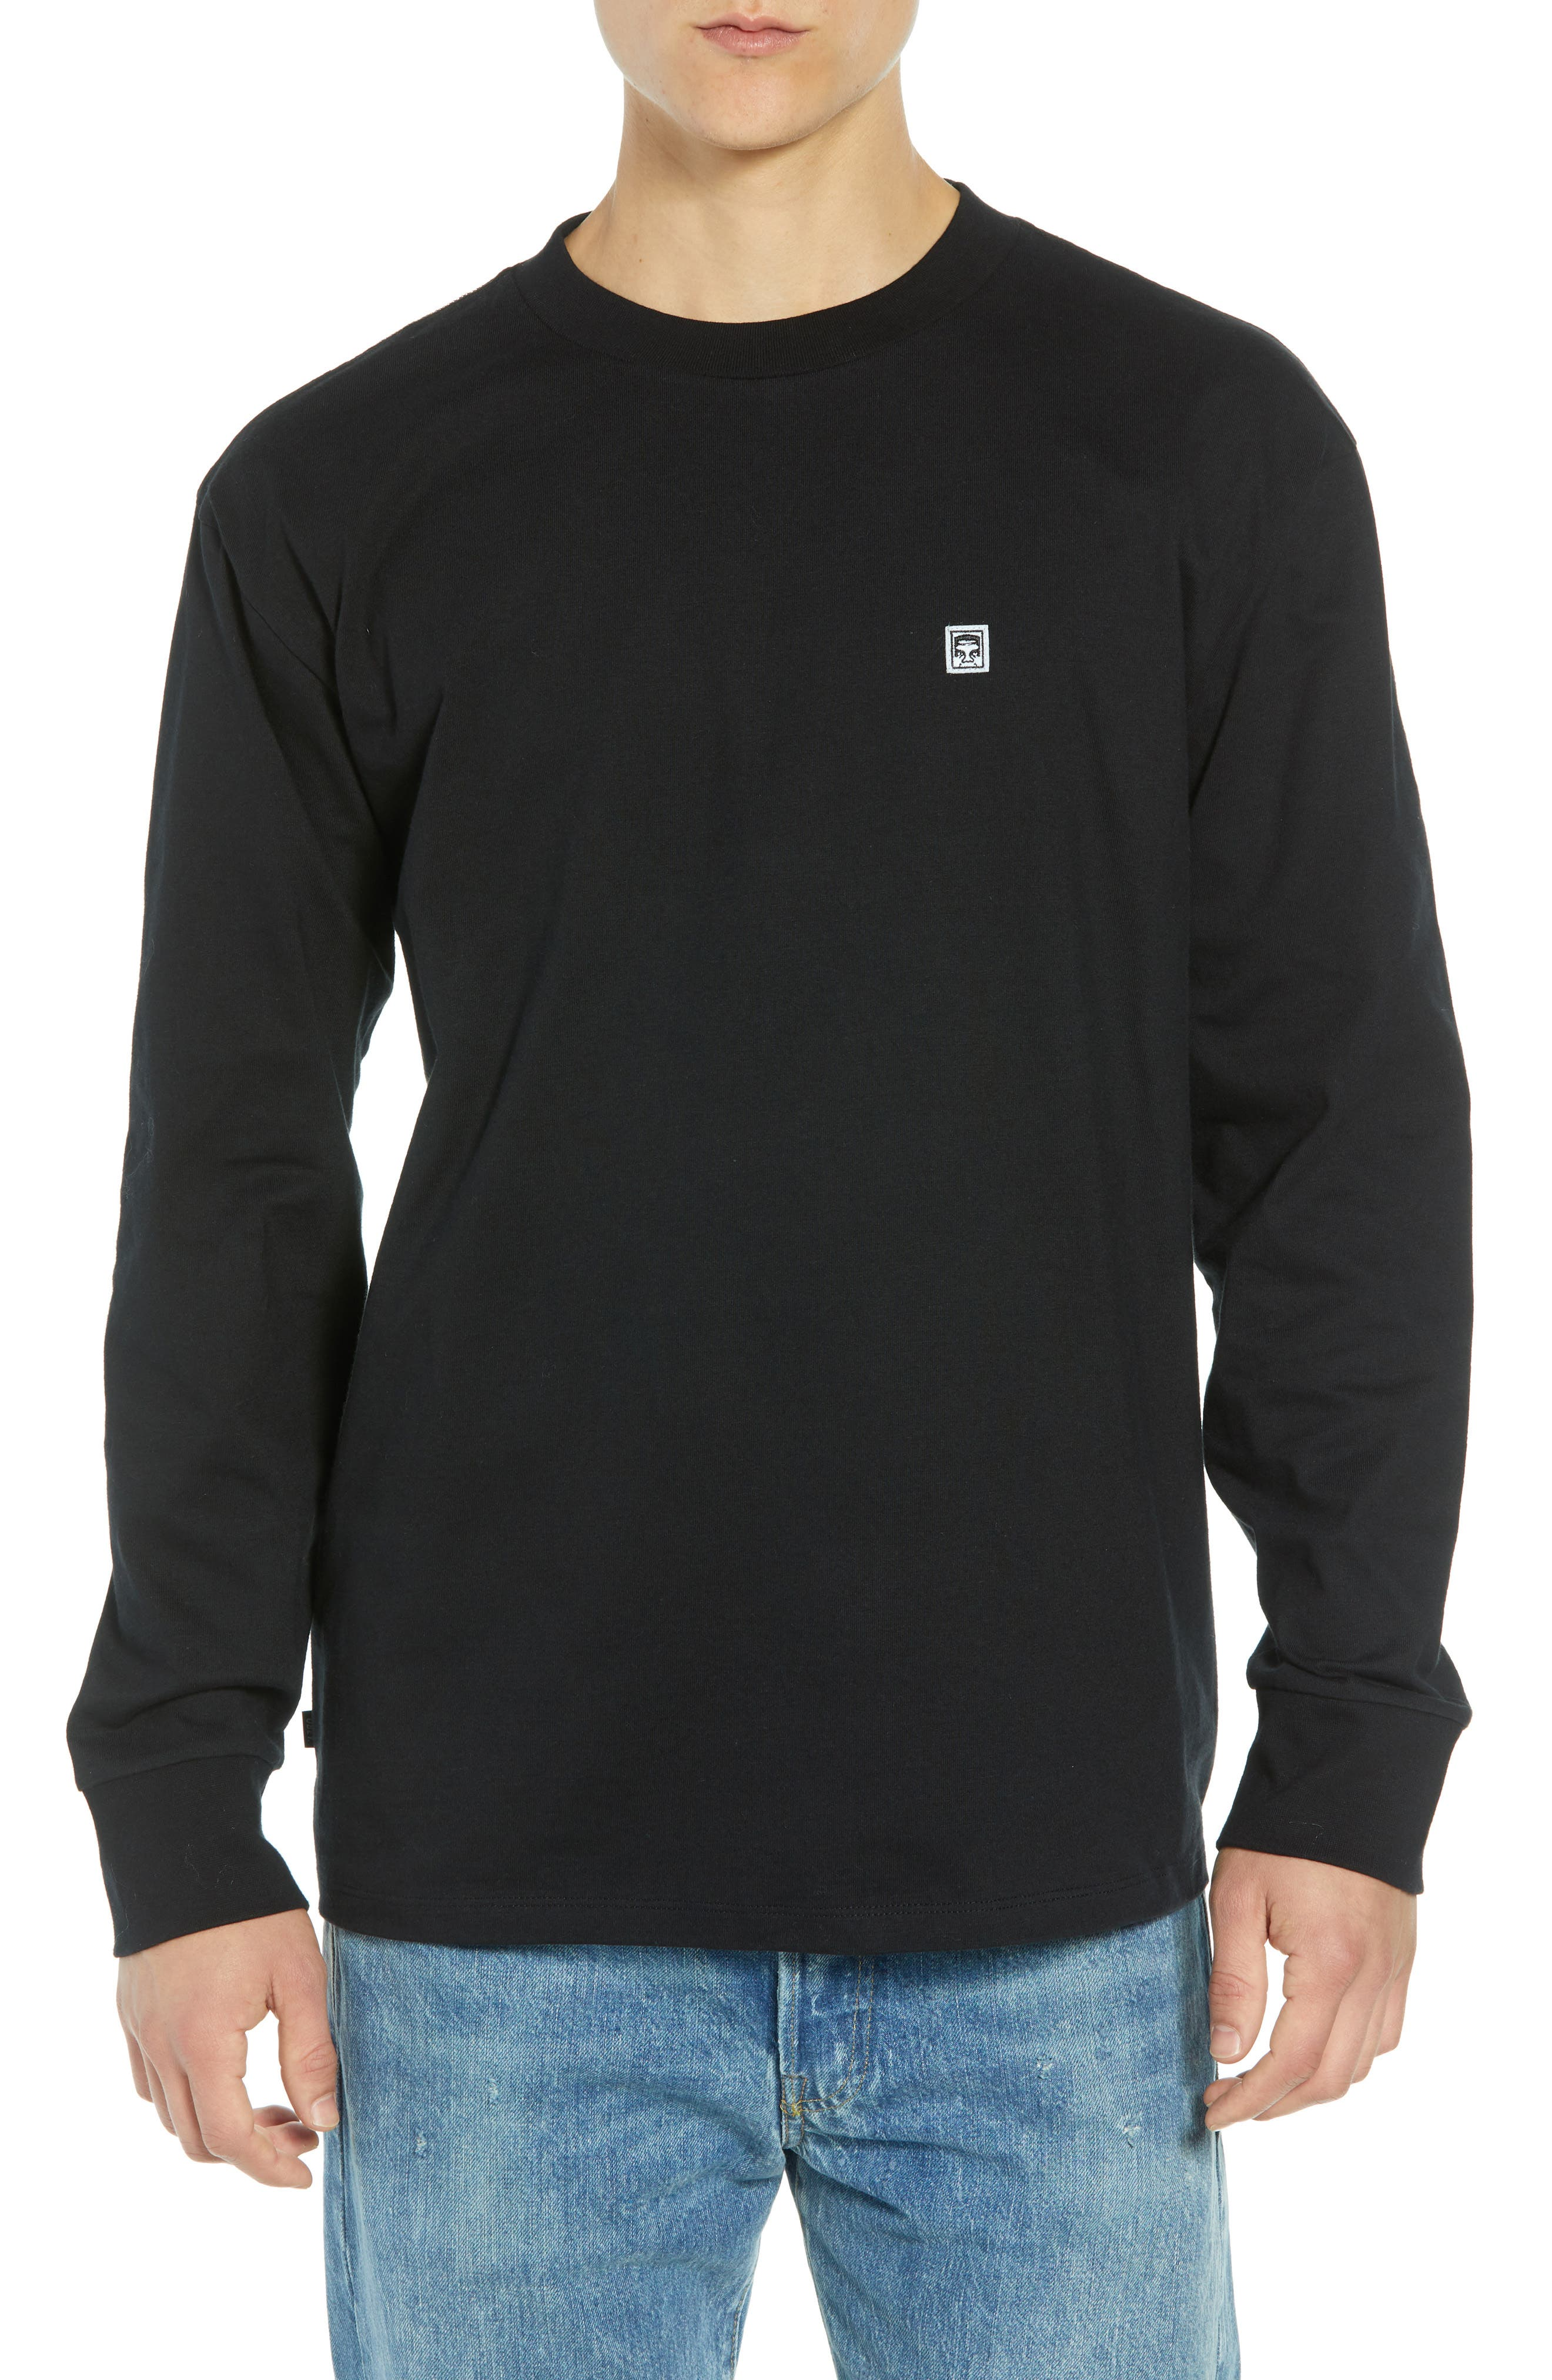 Eighty-Nine Solid Box Long Sleeve T-Shirt,                         Main,                         color, BLACK MULTI